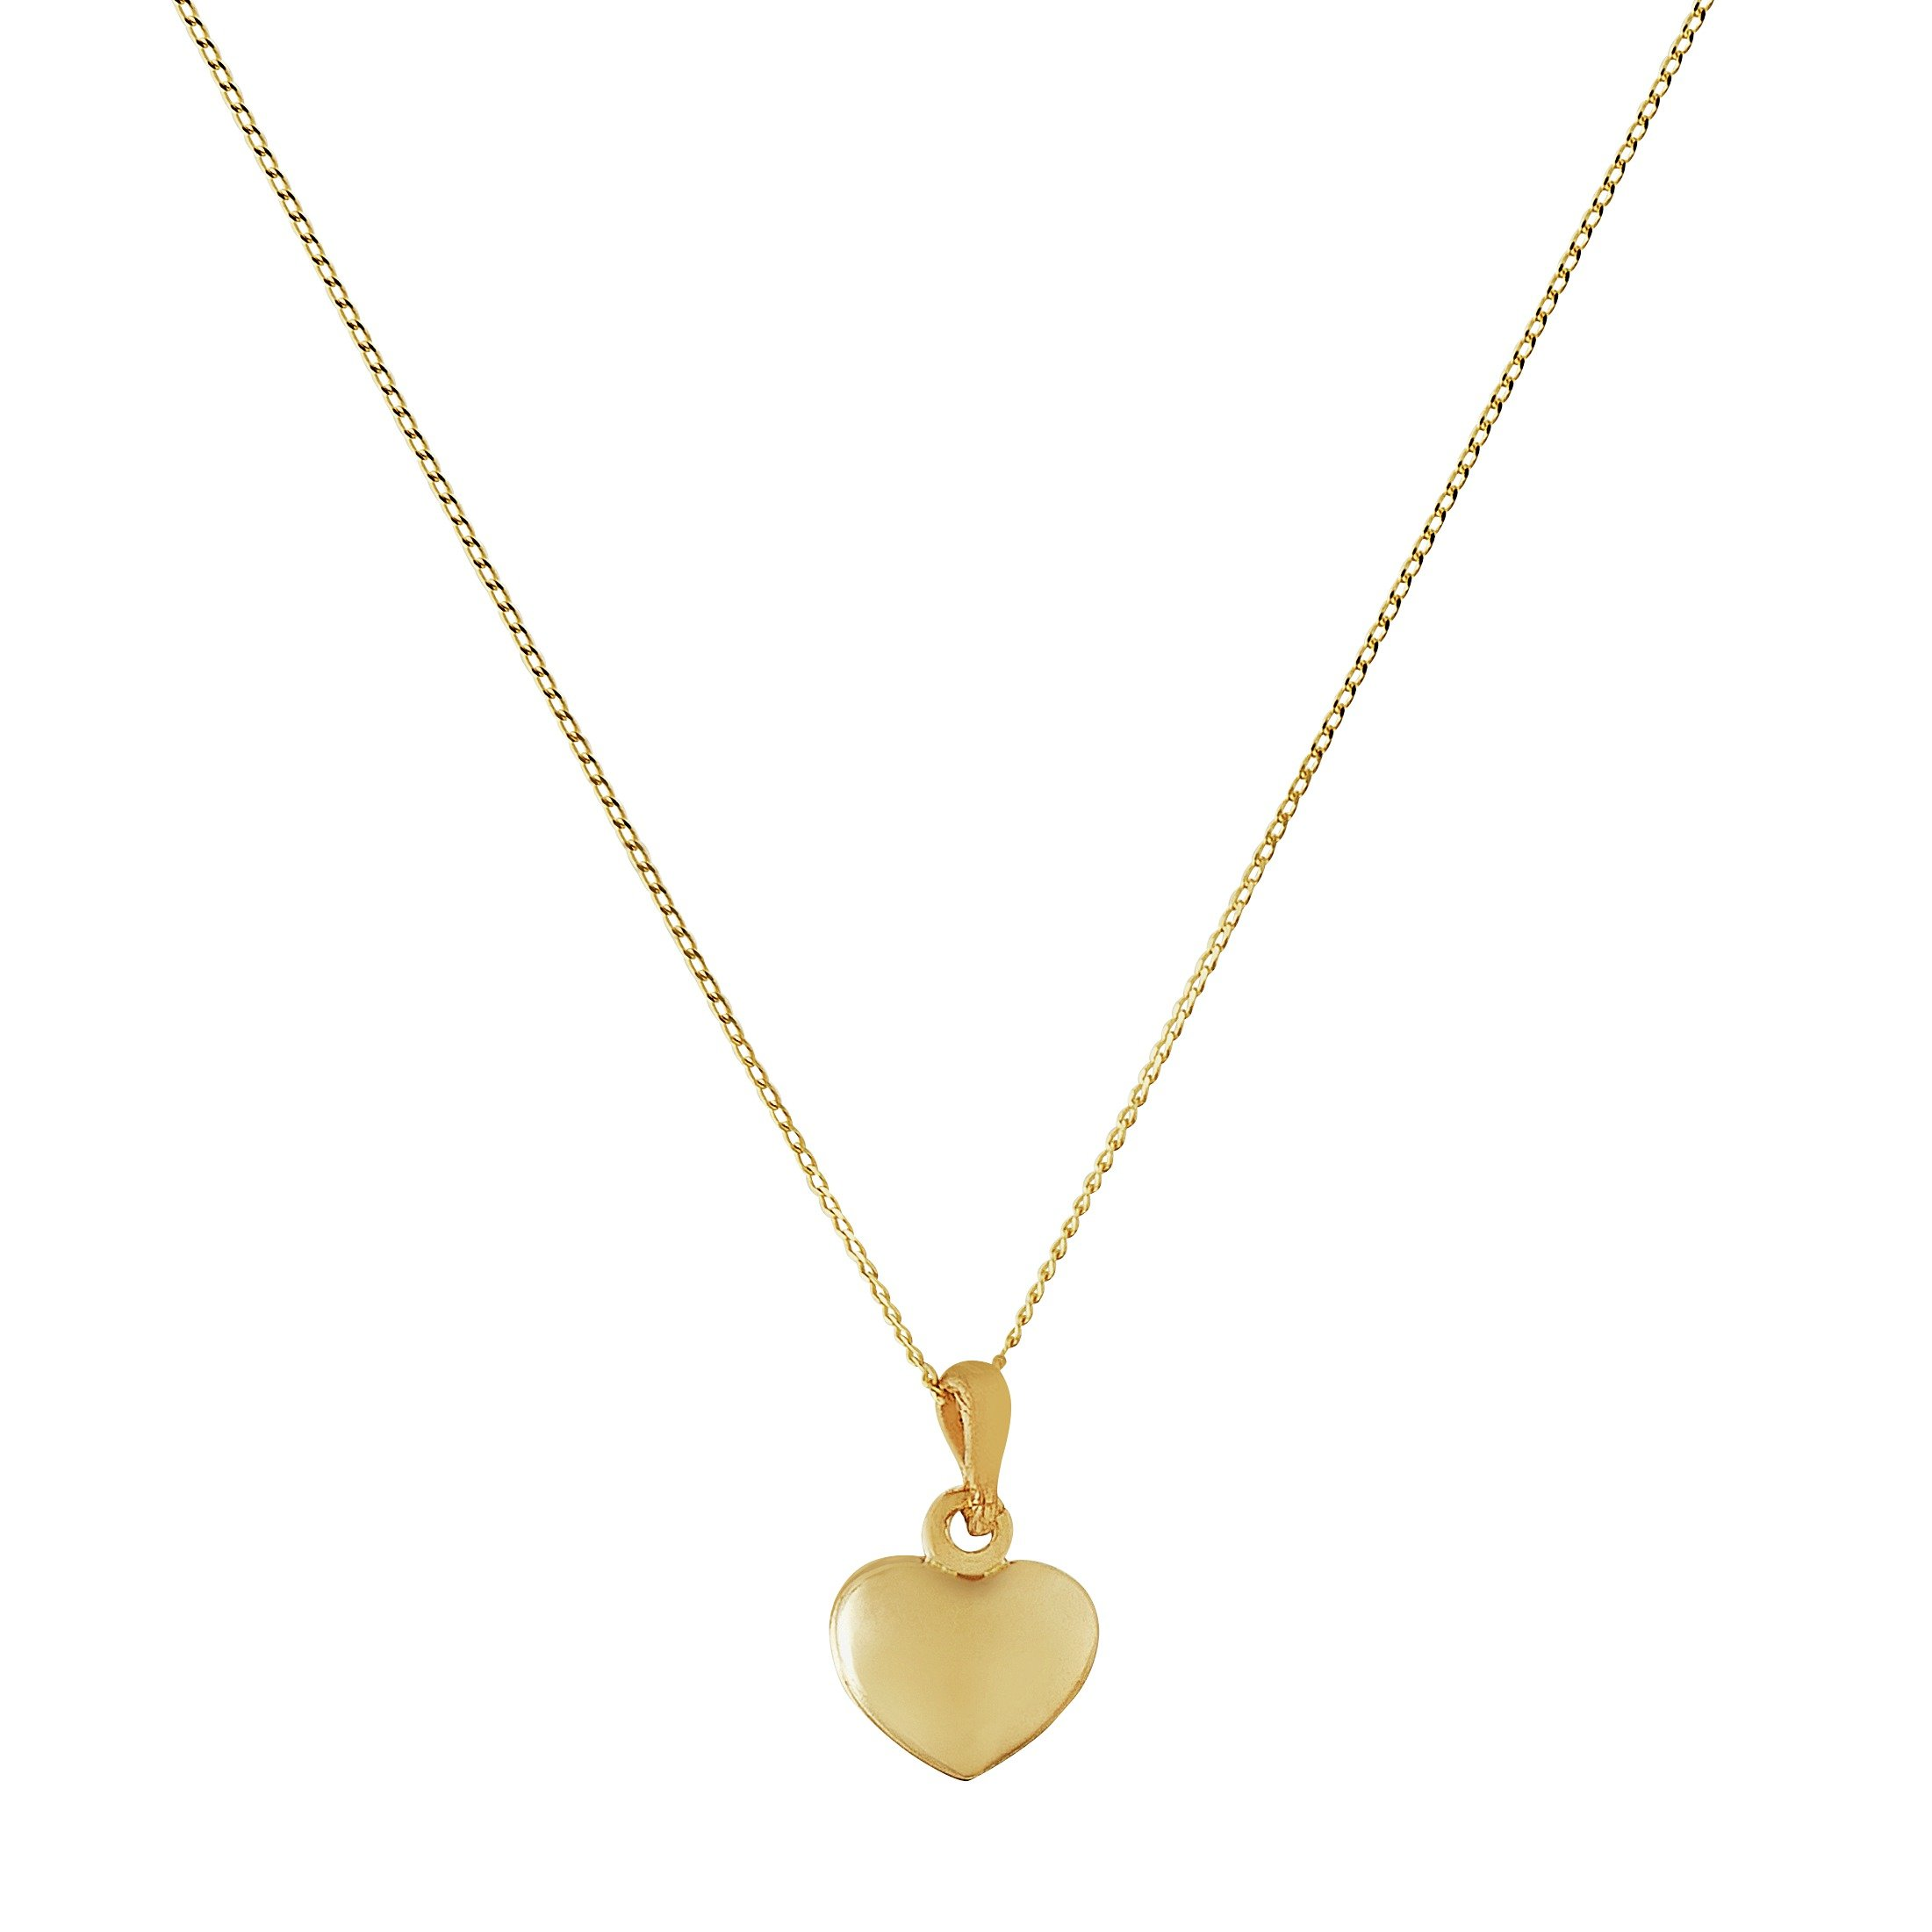 Image of Revere 9ct Gold Heart Pendant